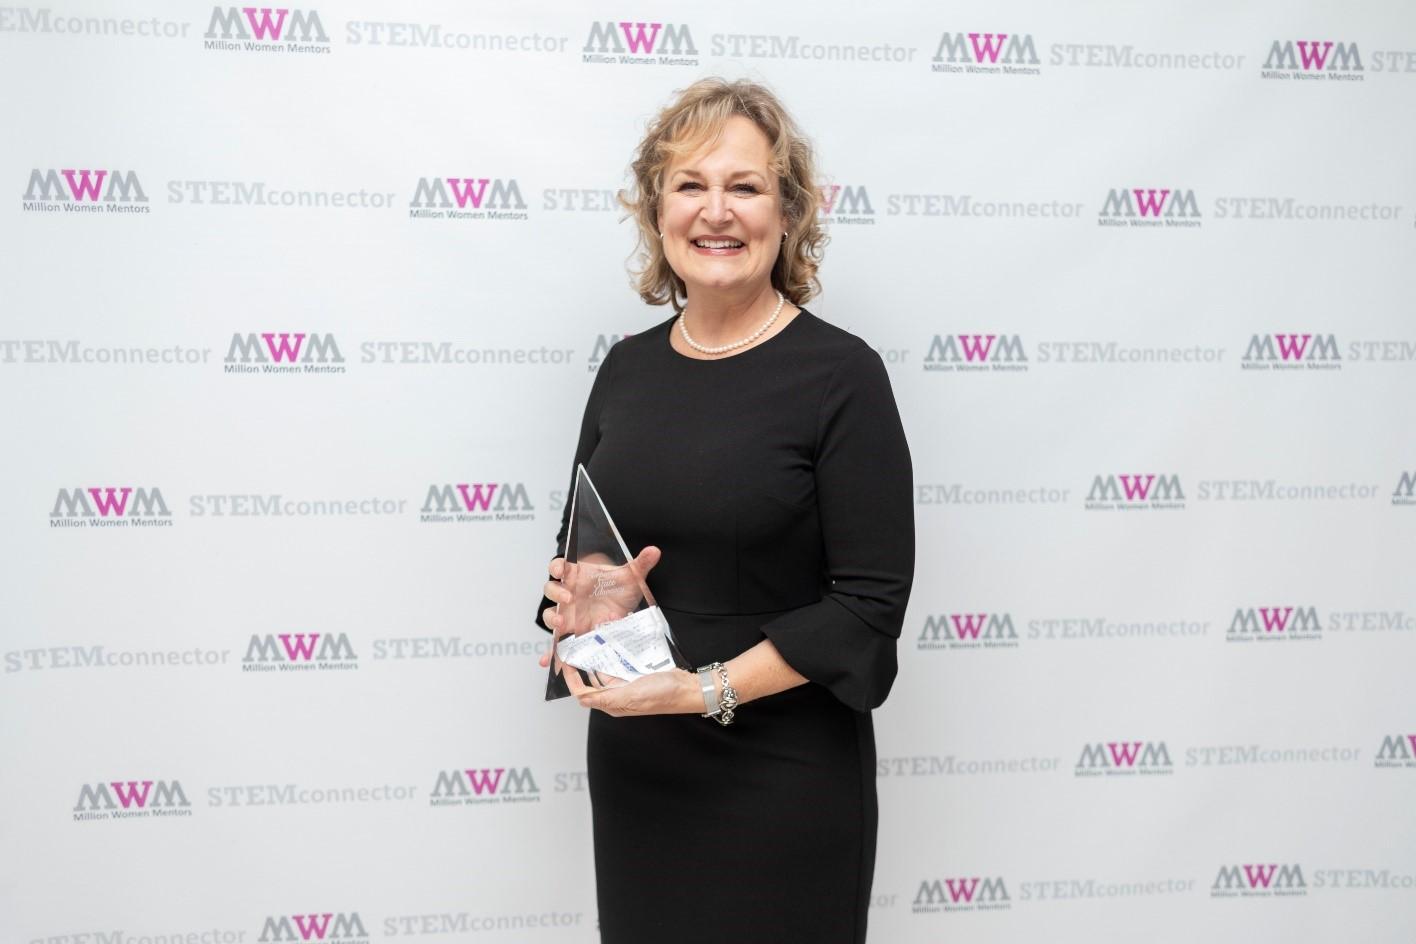 Senior manager with award